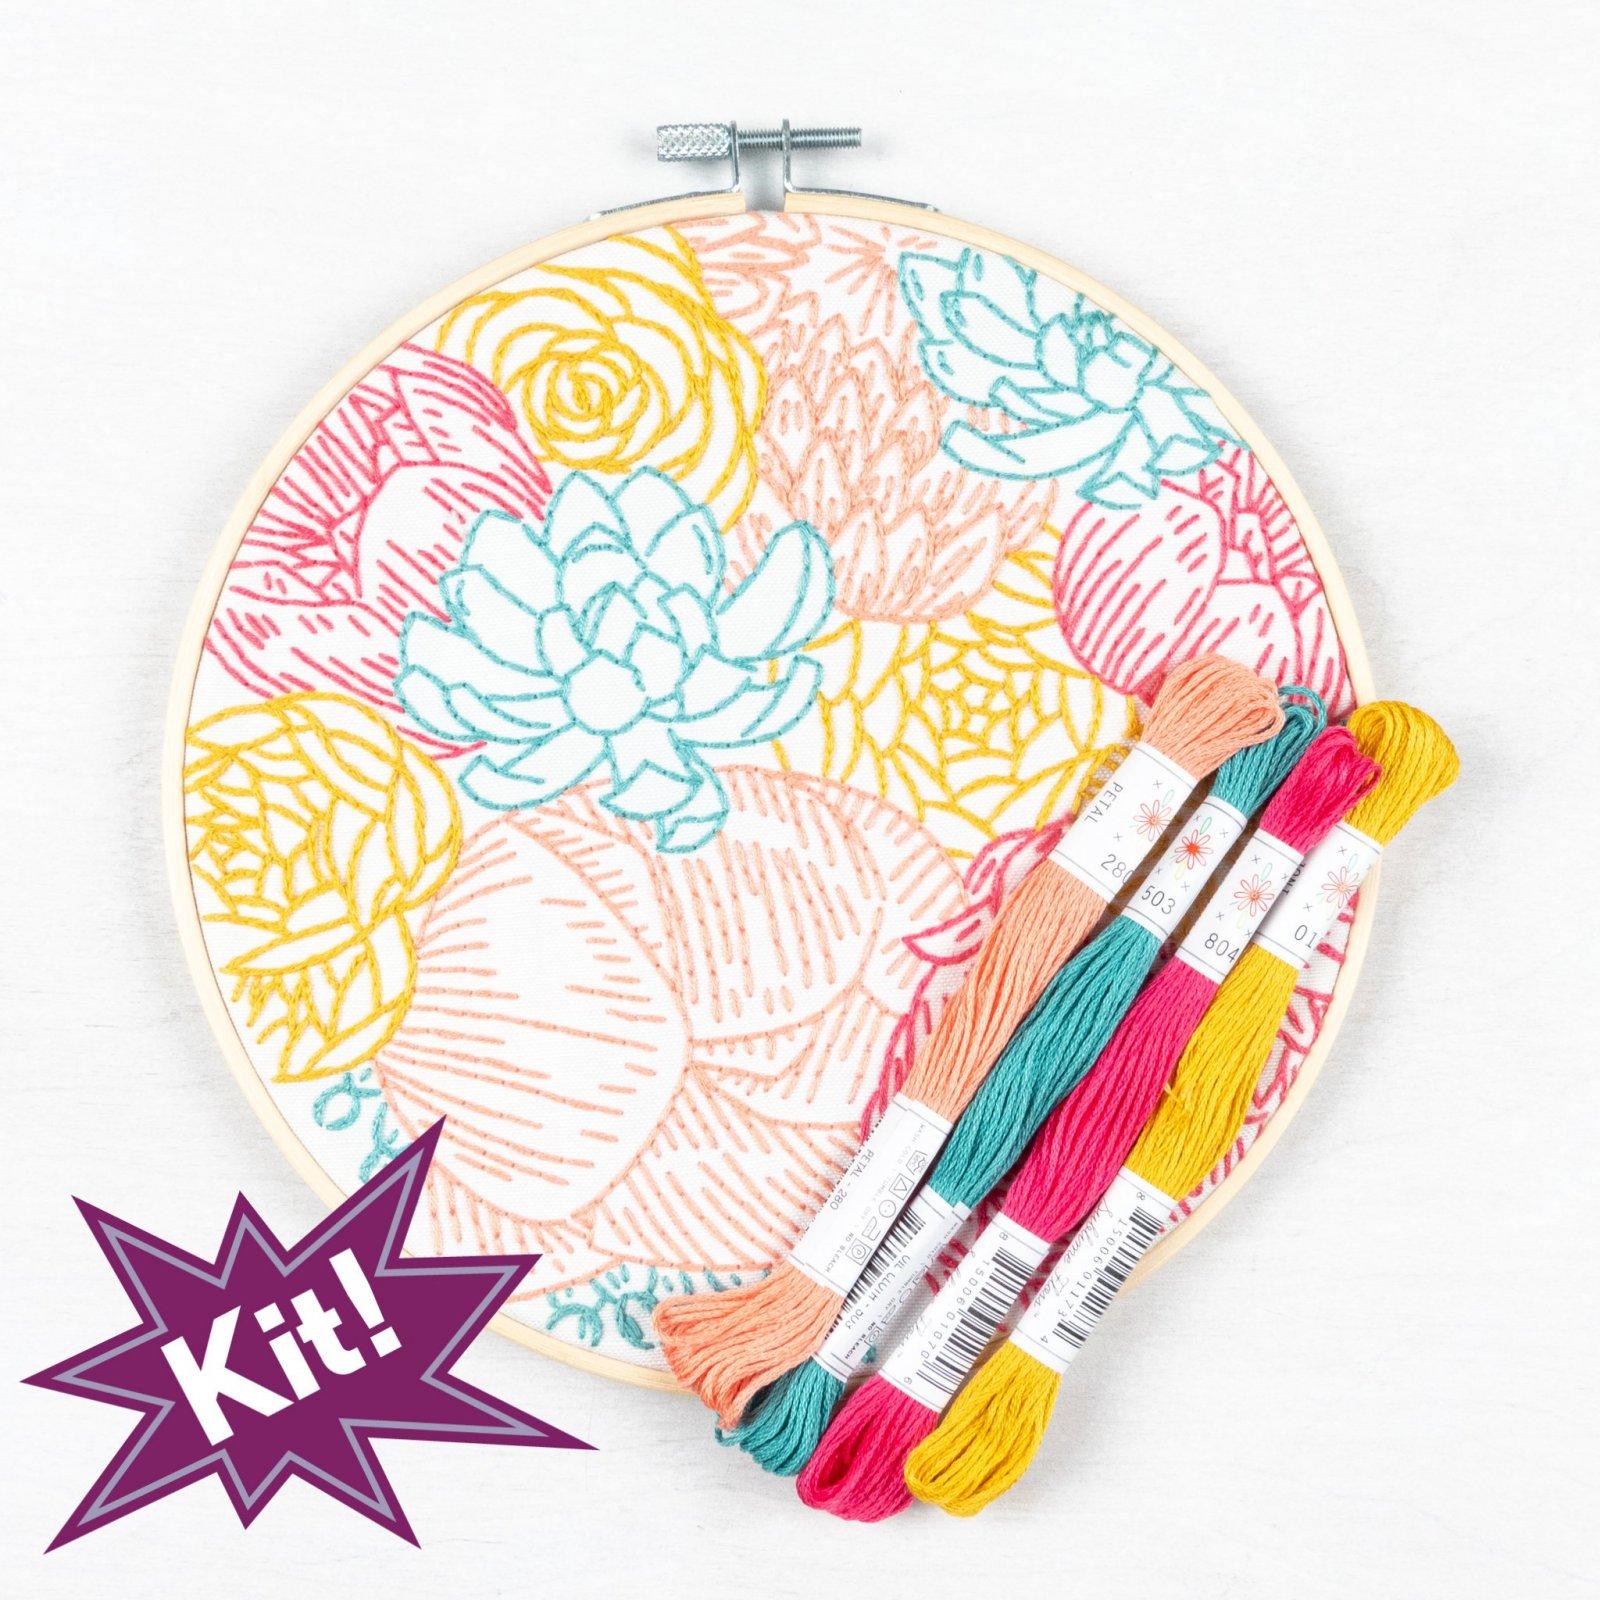 PopLush Embroidery Kits